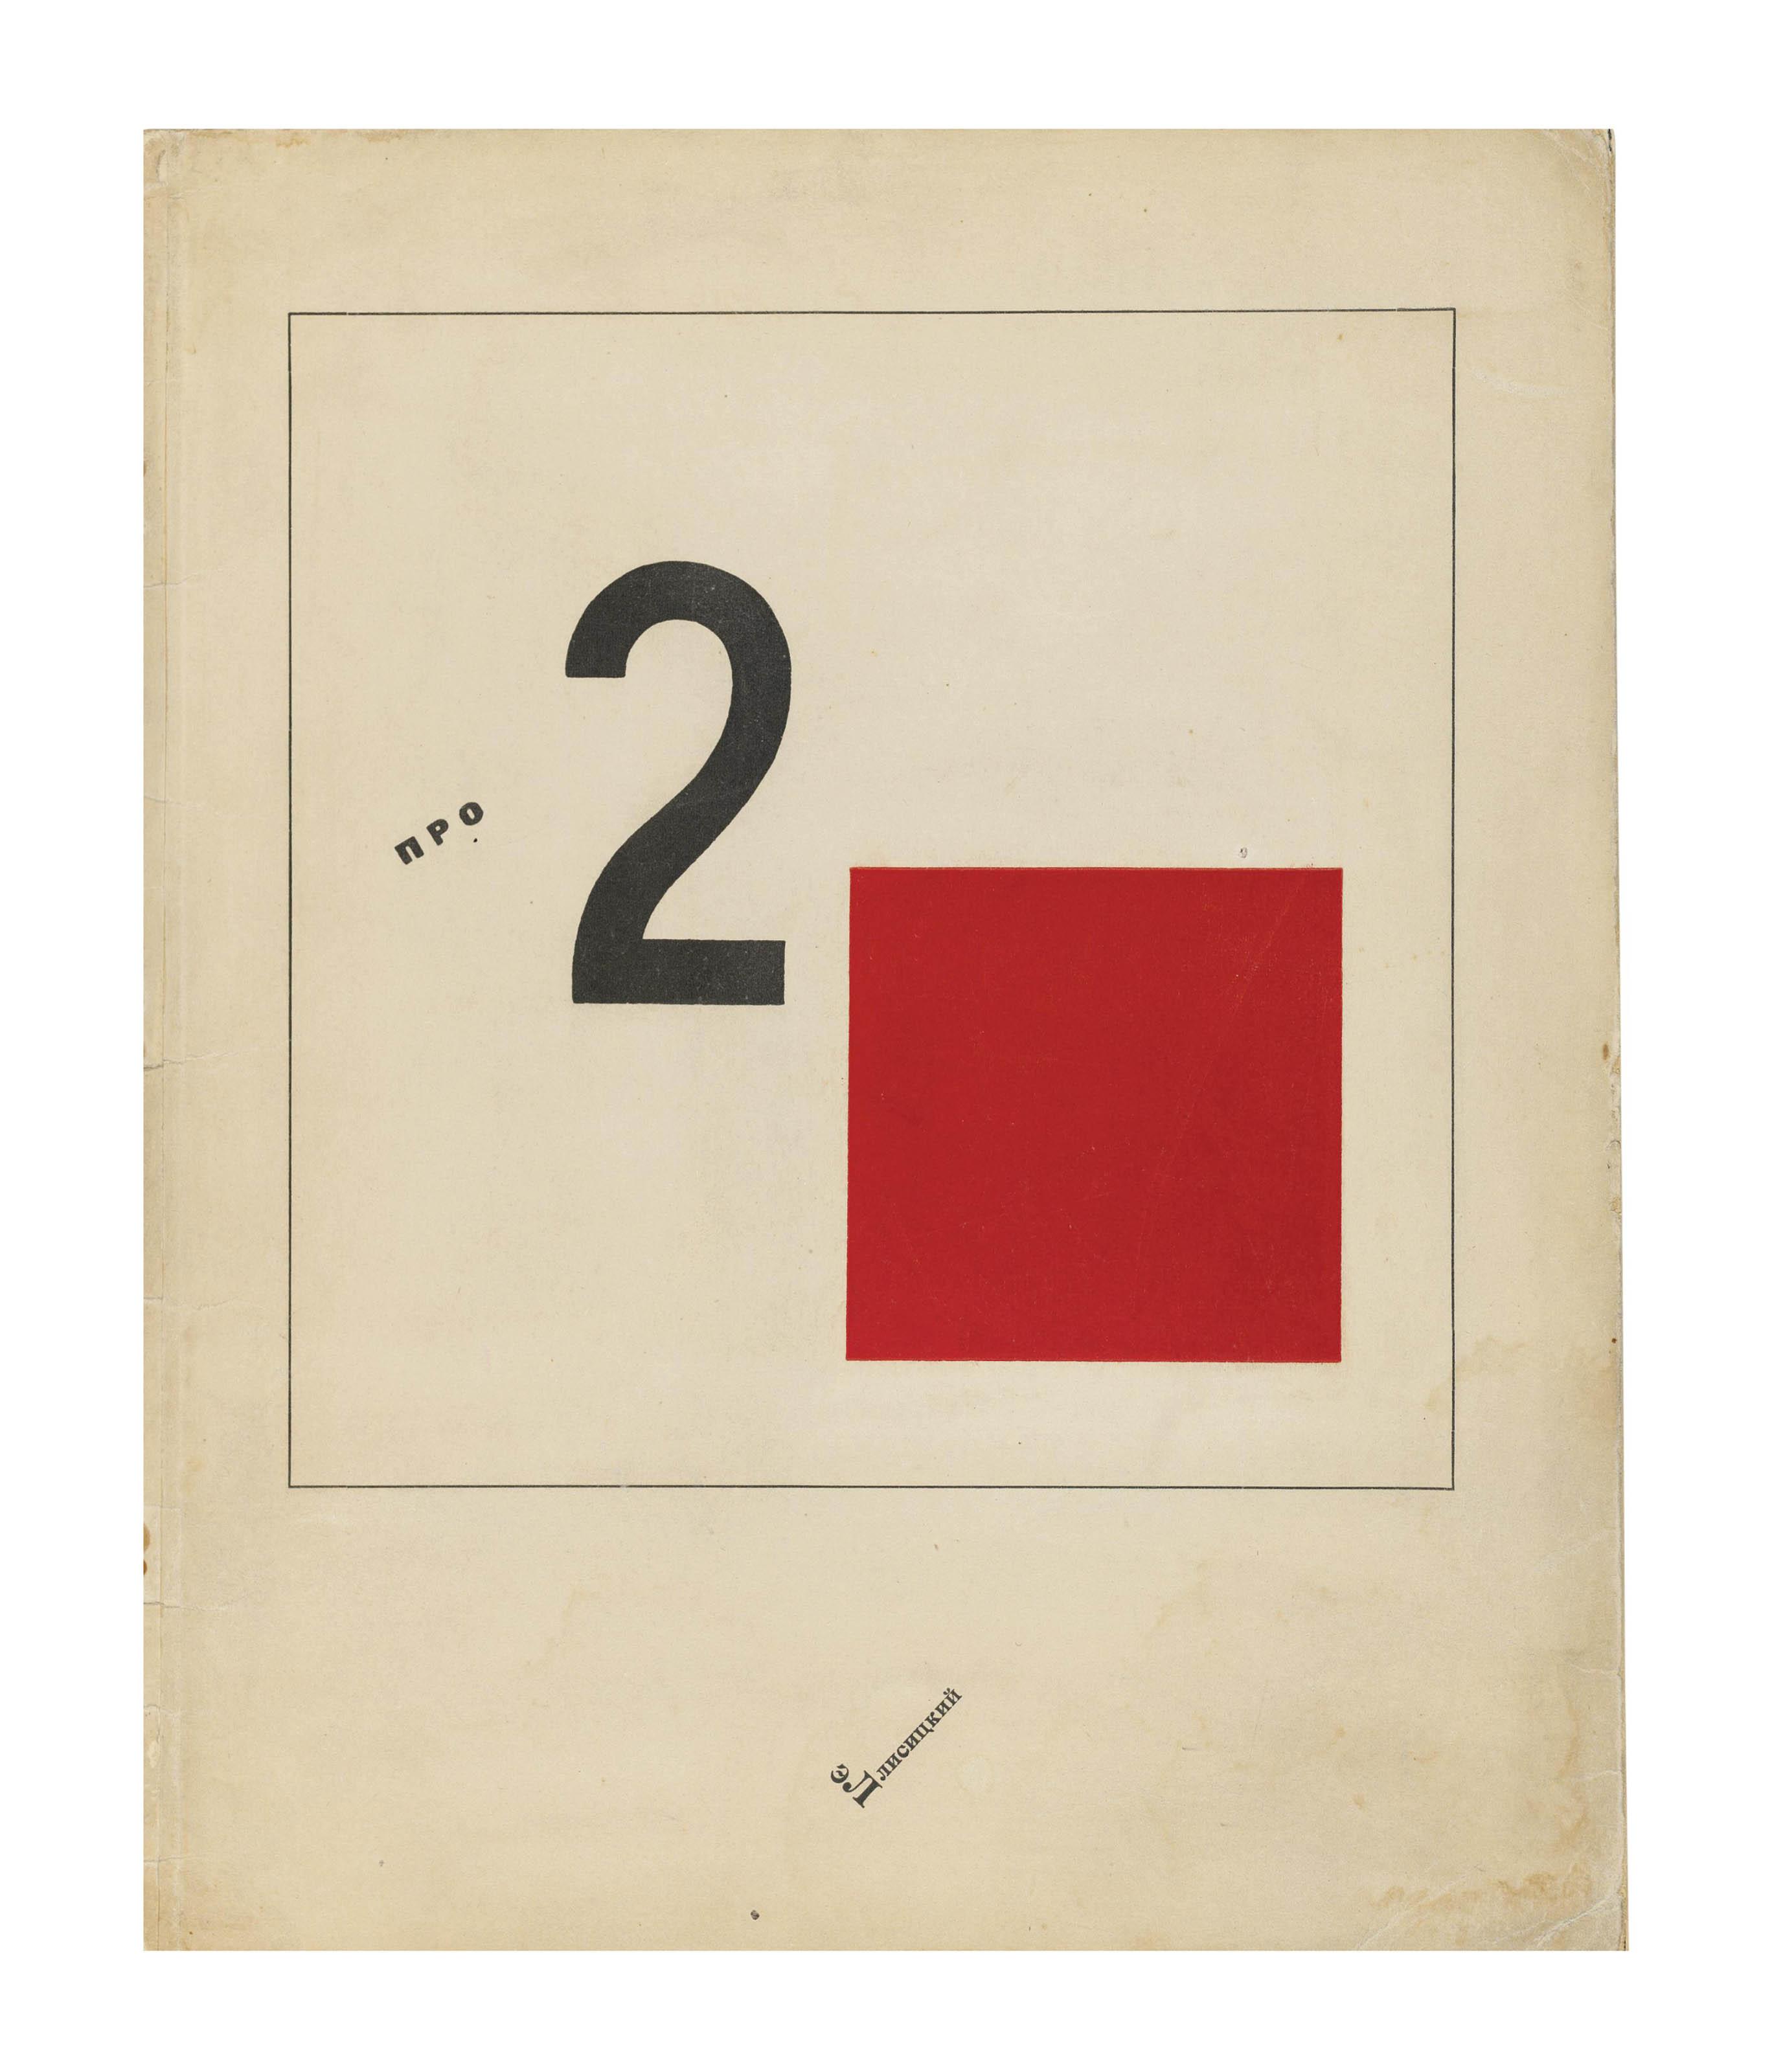 LISSITZKY, Lazar Markovich, 'El' (1890-1941). Pro dva kvadrata. Suprematicheskii skaz v 6ti postroikakh. [About Two Squares: A Suprematist Tale in 6 Constructions.] Berlin: Scythians, 1922.